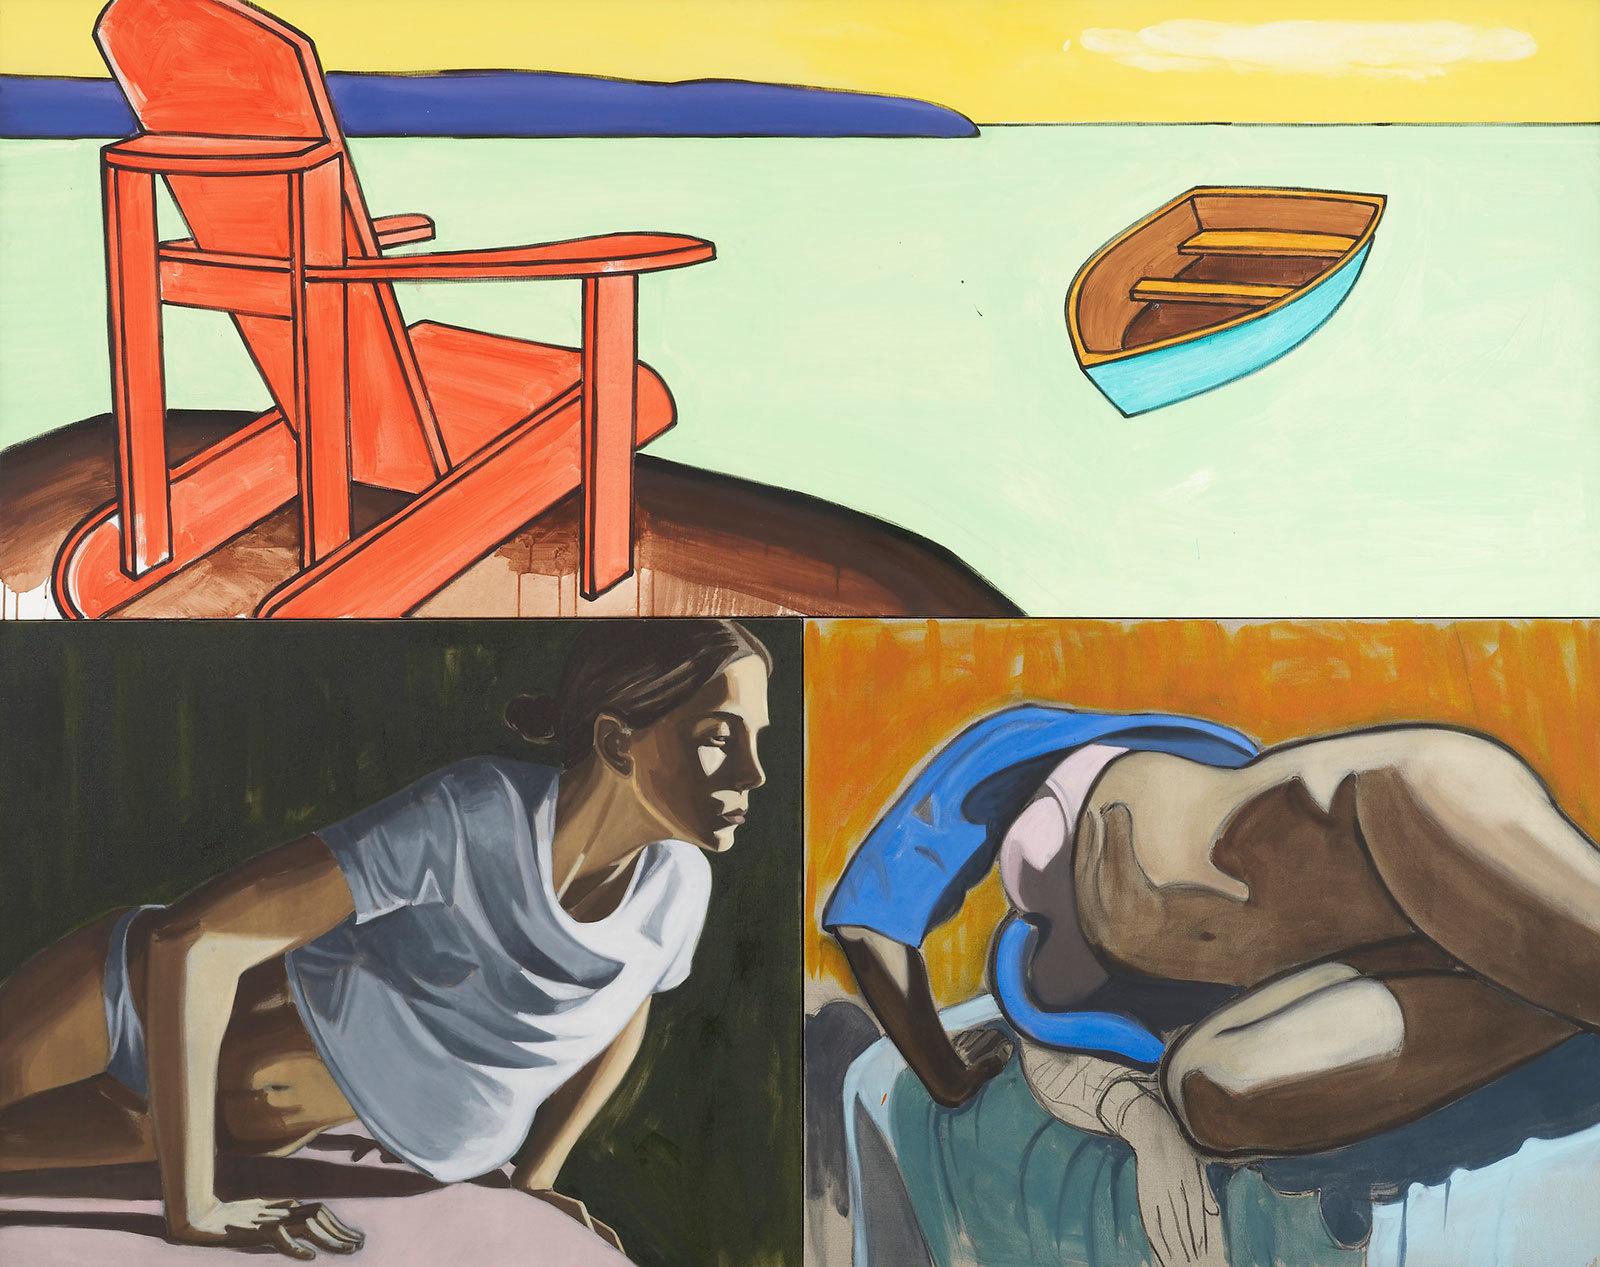 Maureen-Paley-David-Salle-Artwork--Large-Red-Chair-2011.jpg